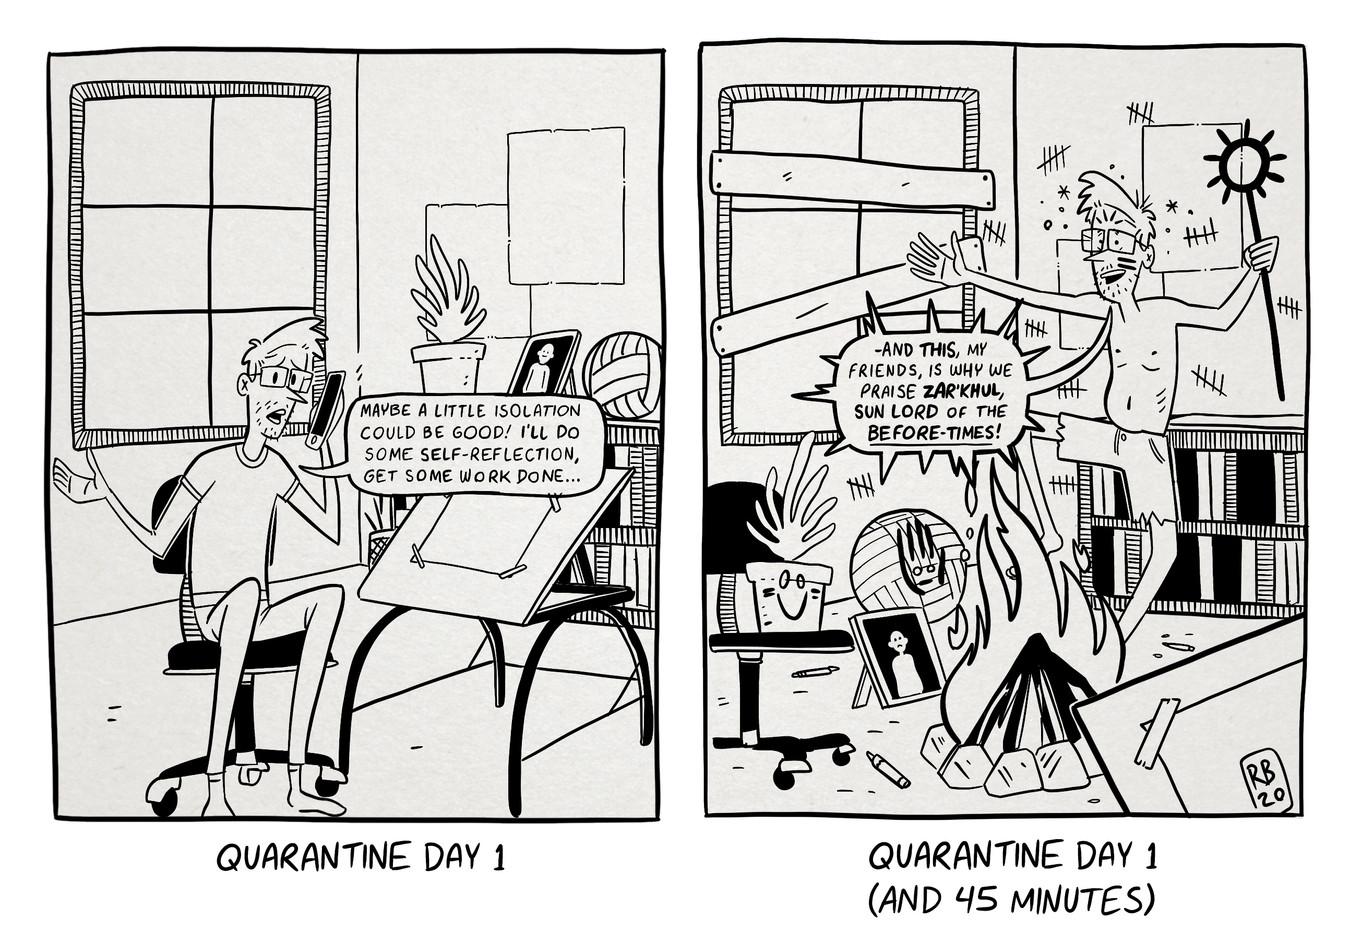 Quarantine Chaos